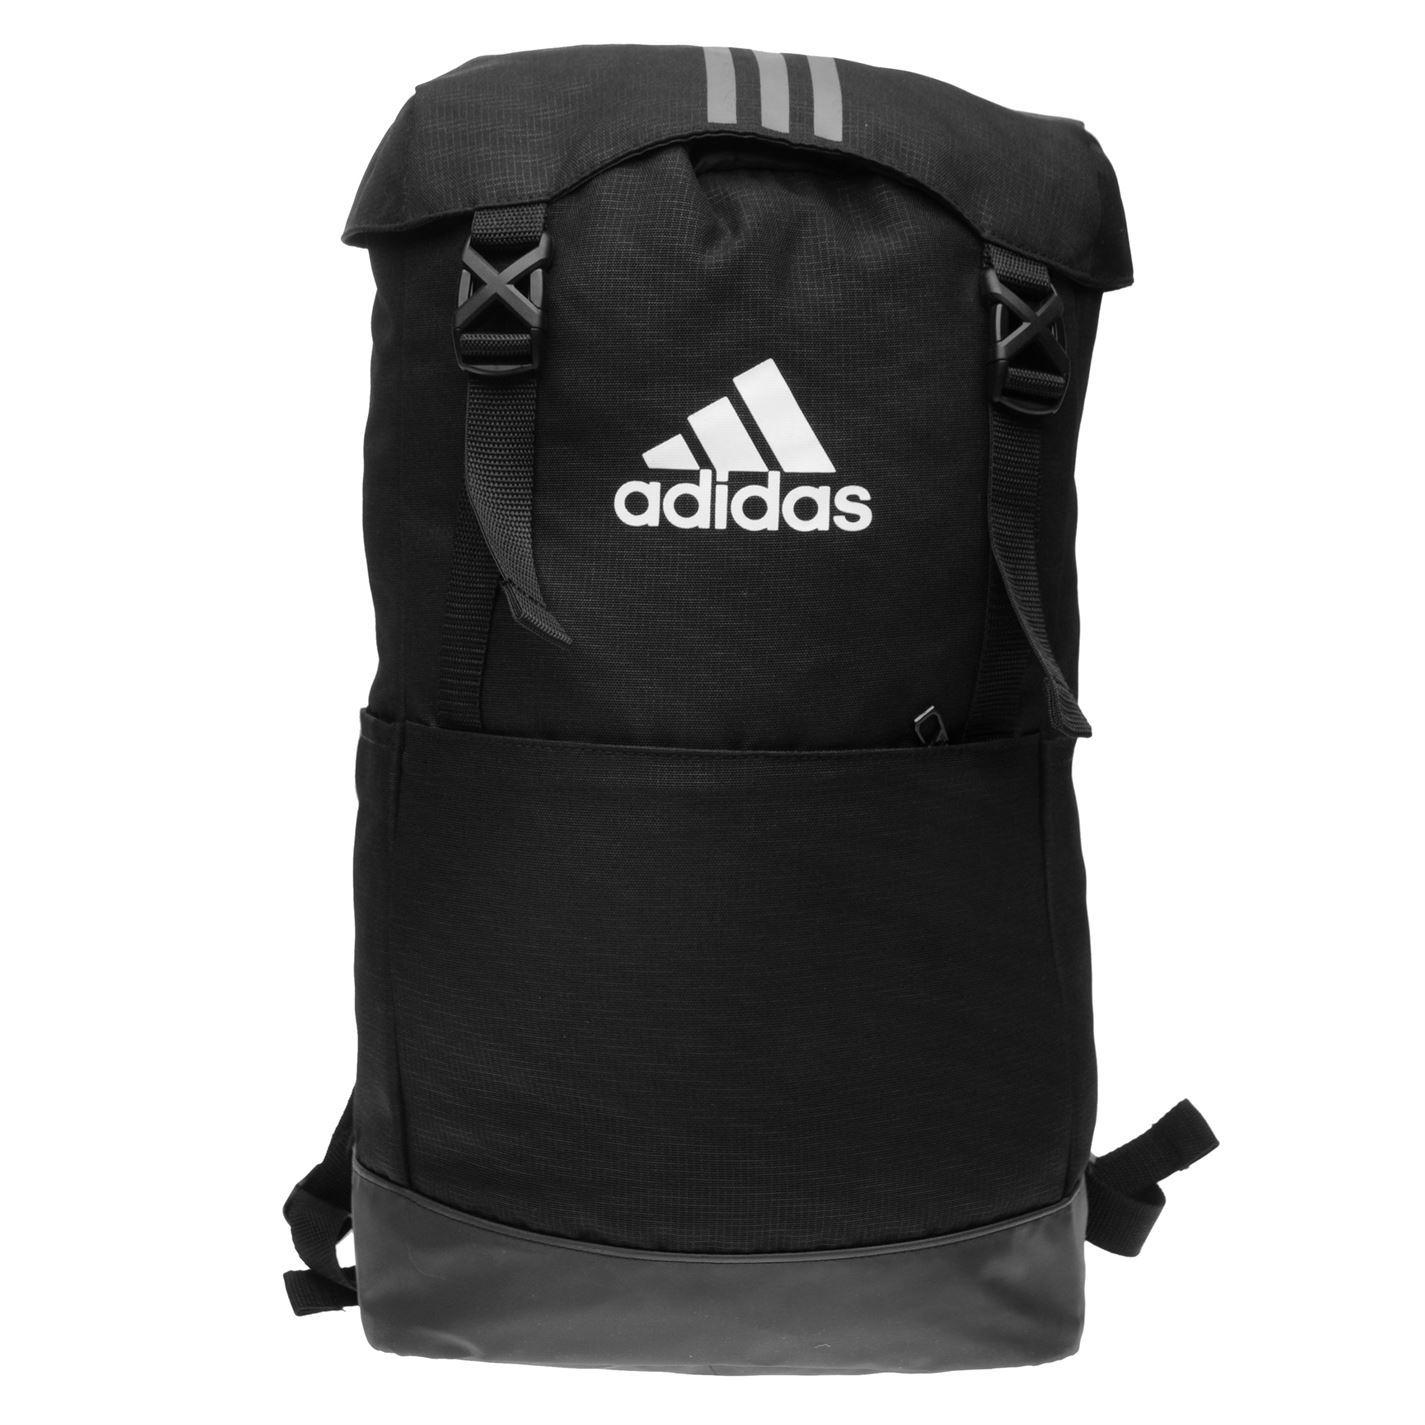 0b13335bb7 adidas 3 Stripe Performance Backpack Black Wht Sports Gym Bag Rucksack  Carryall